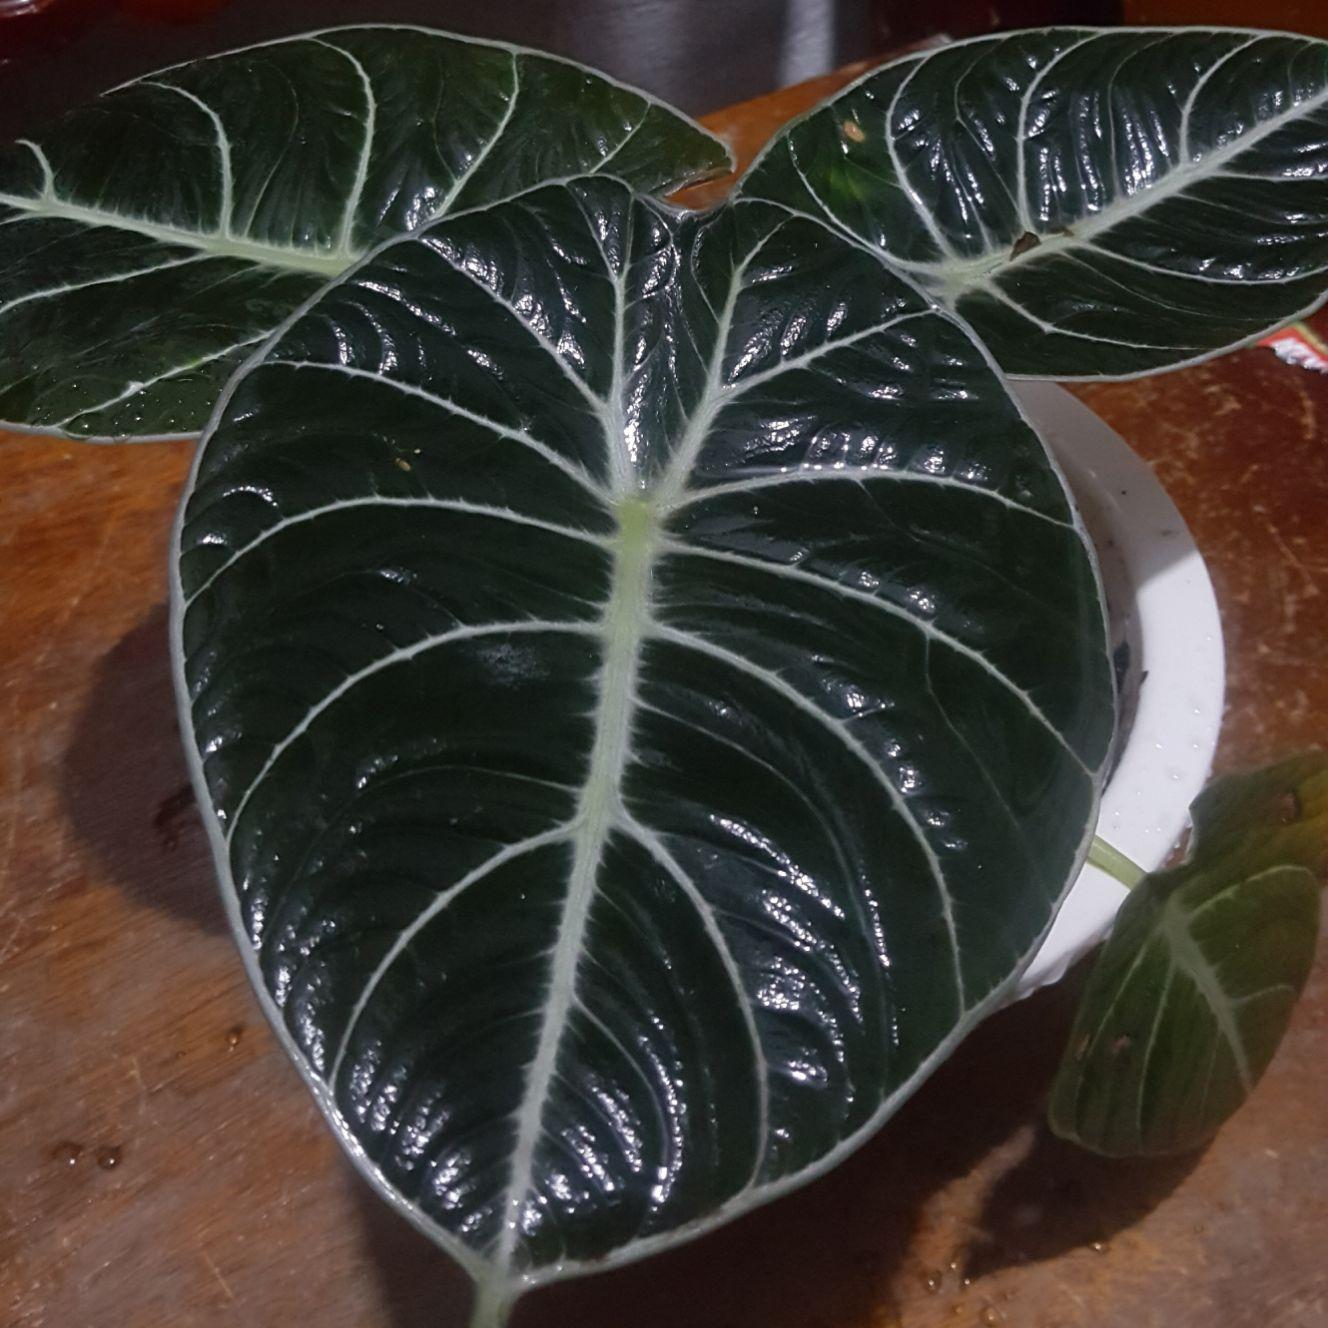 Alocasia Black Velvet Buy Sell Online Garden Decor Ornaments With Cheap Price Lazada Ph